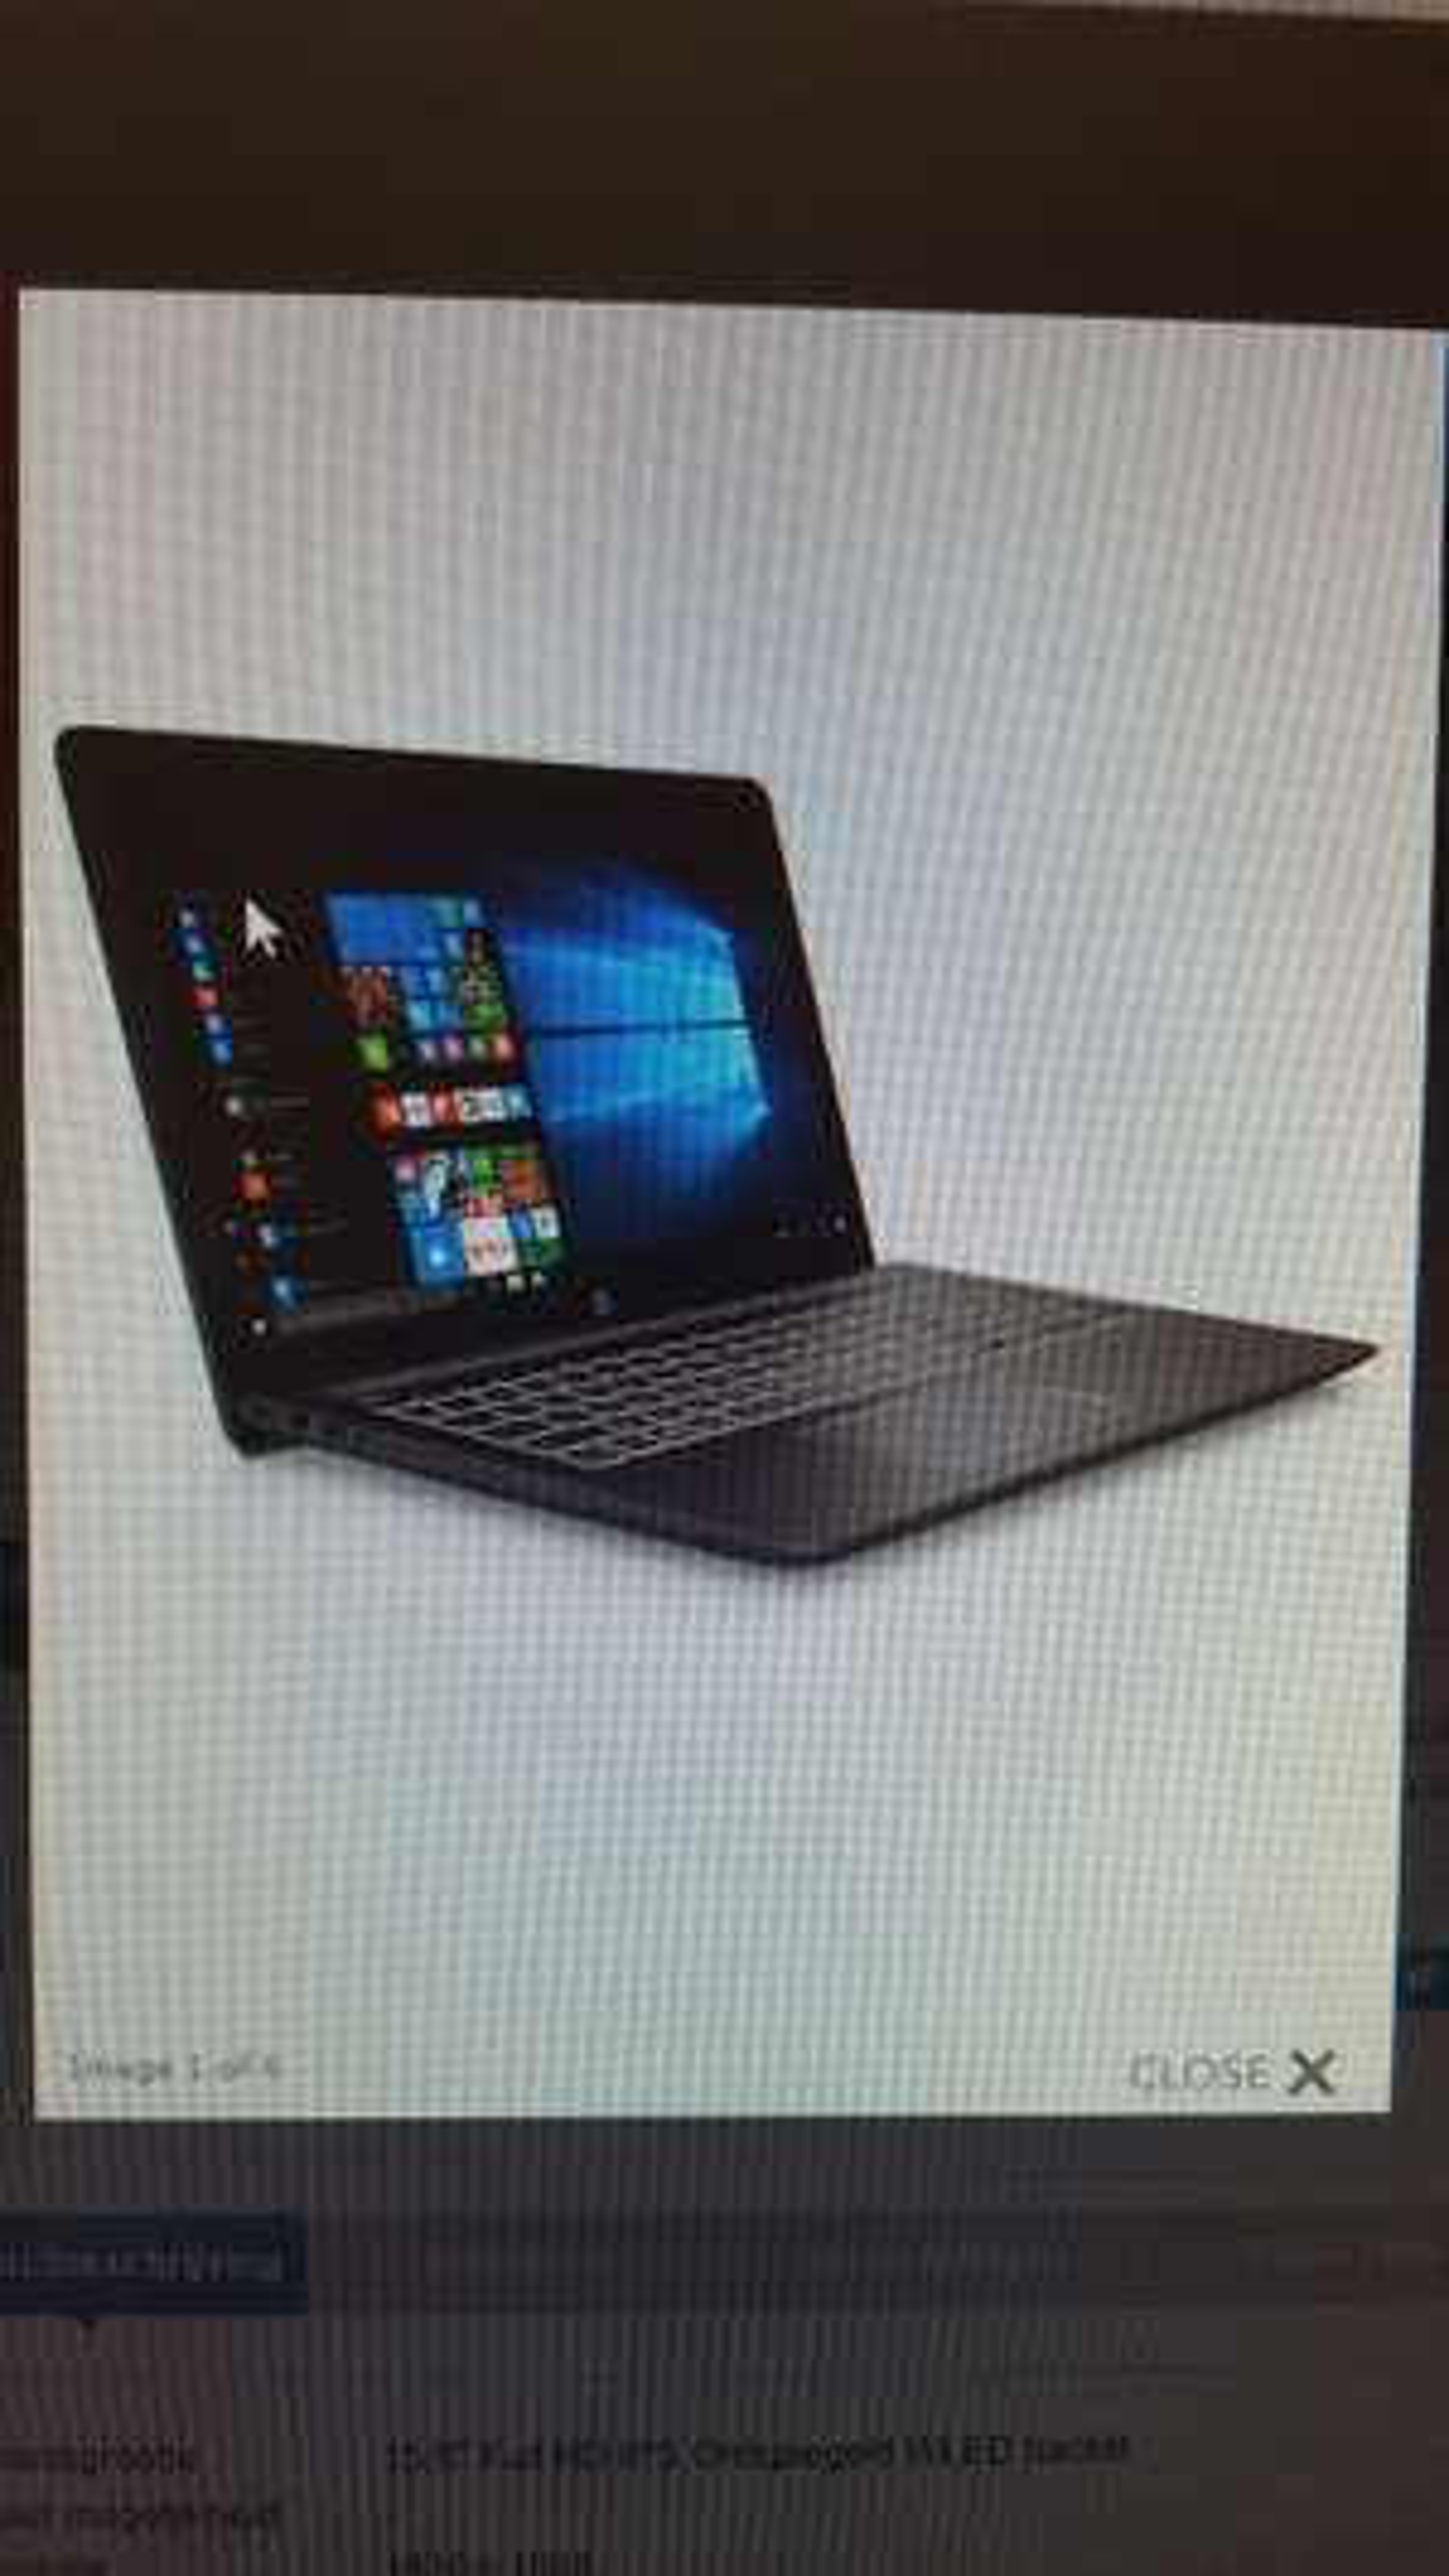 HP Power 15-cb001nd i5-7300/8GB/256gb ssd/1tb hdd/GTX 1050 2gb